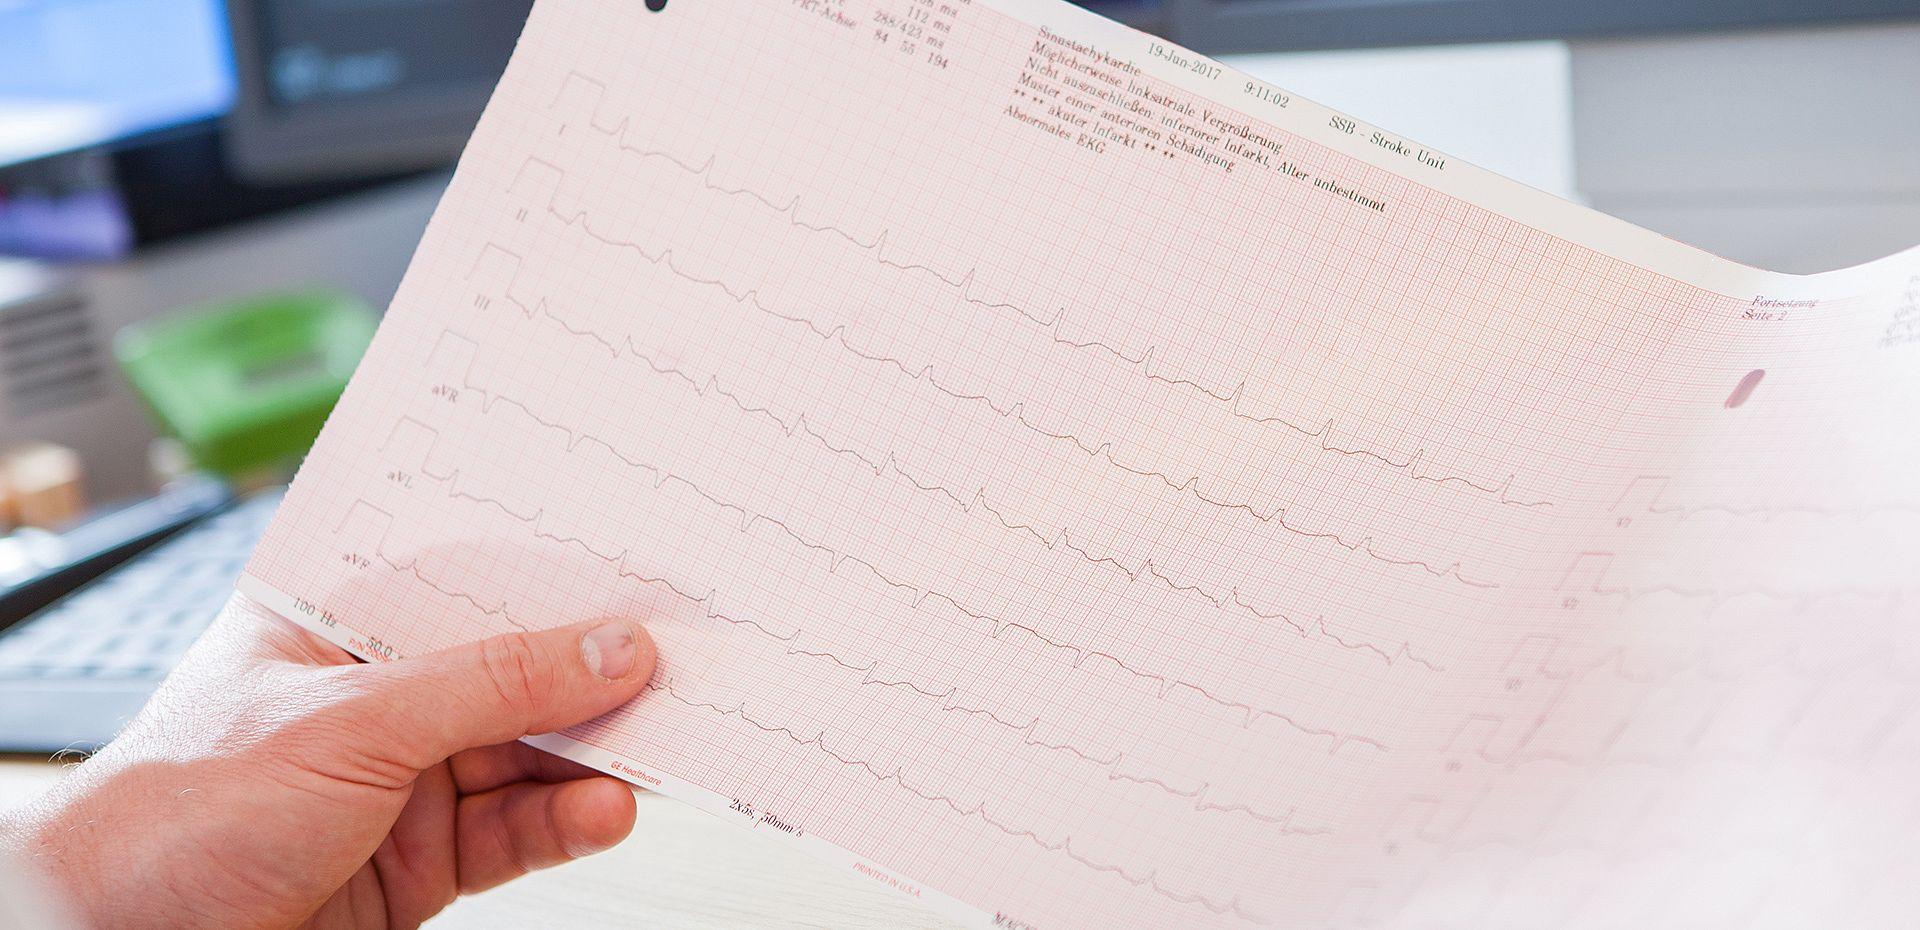 Invasive Elektrophysiologie | Sozialstiftung Bamberg